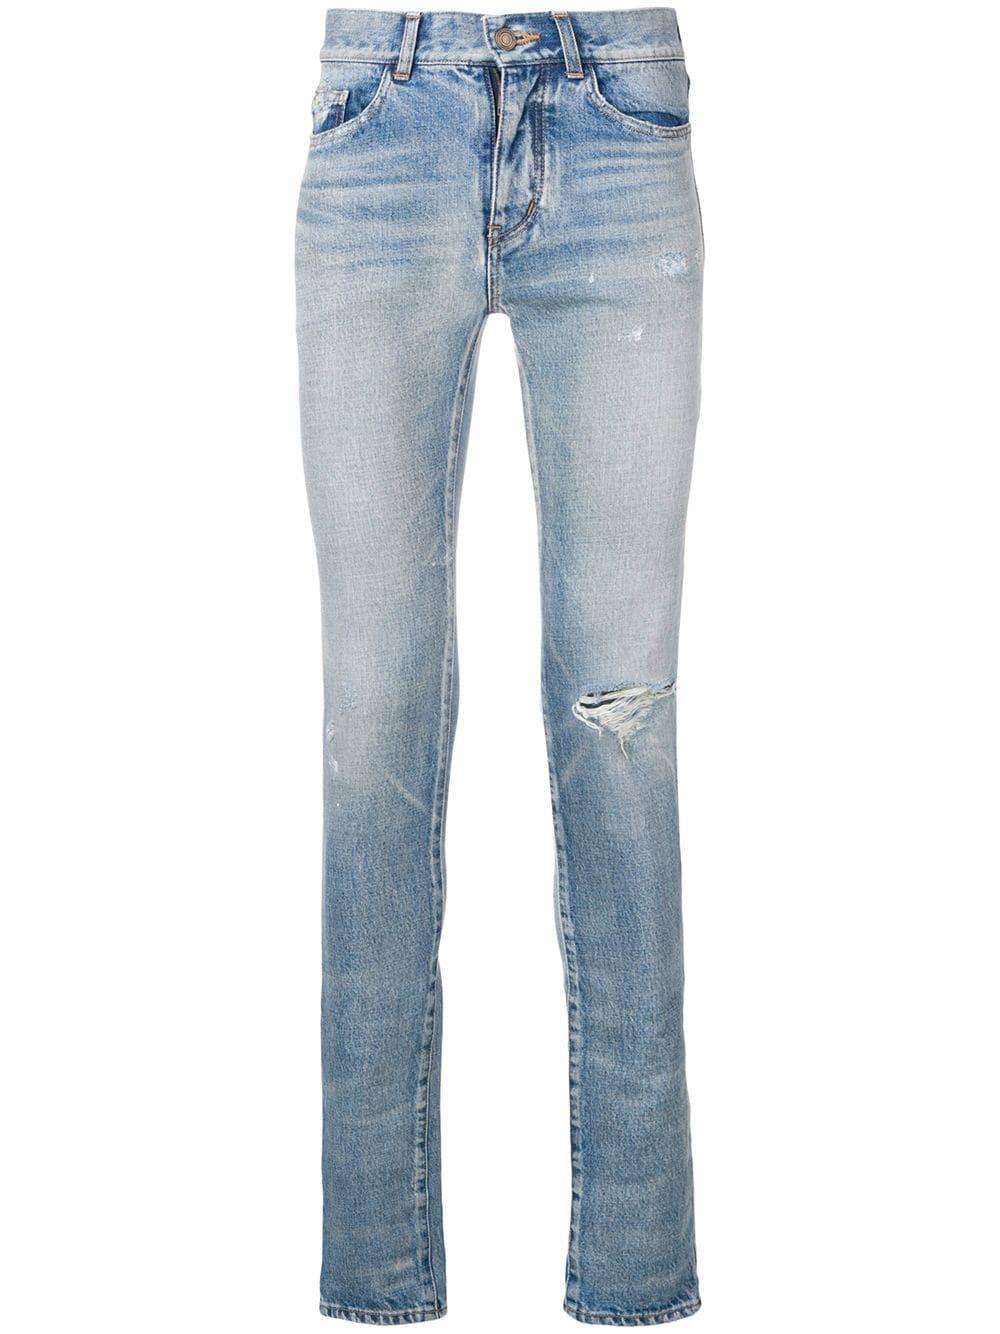 Jean Skinny fit - 590€